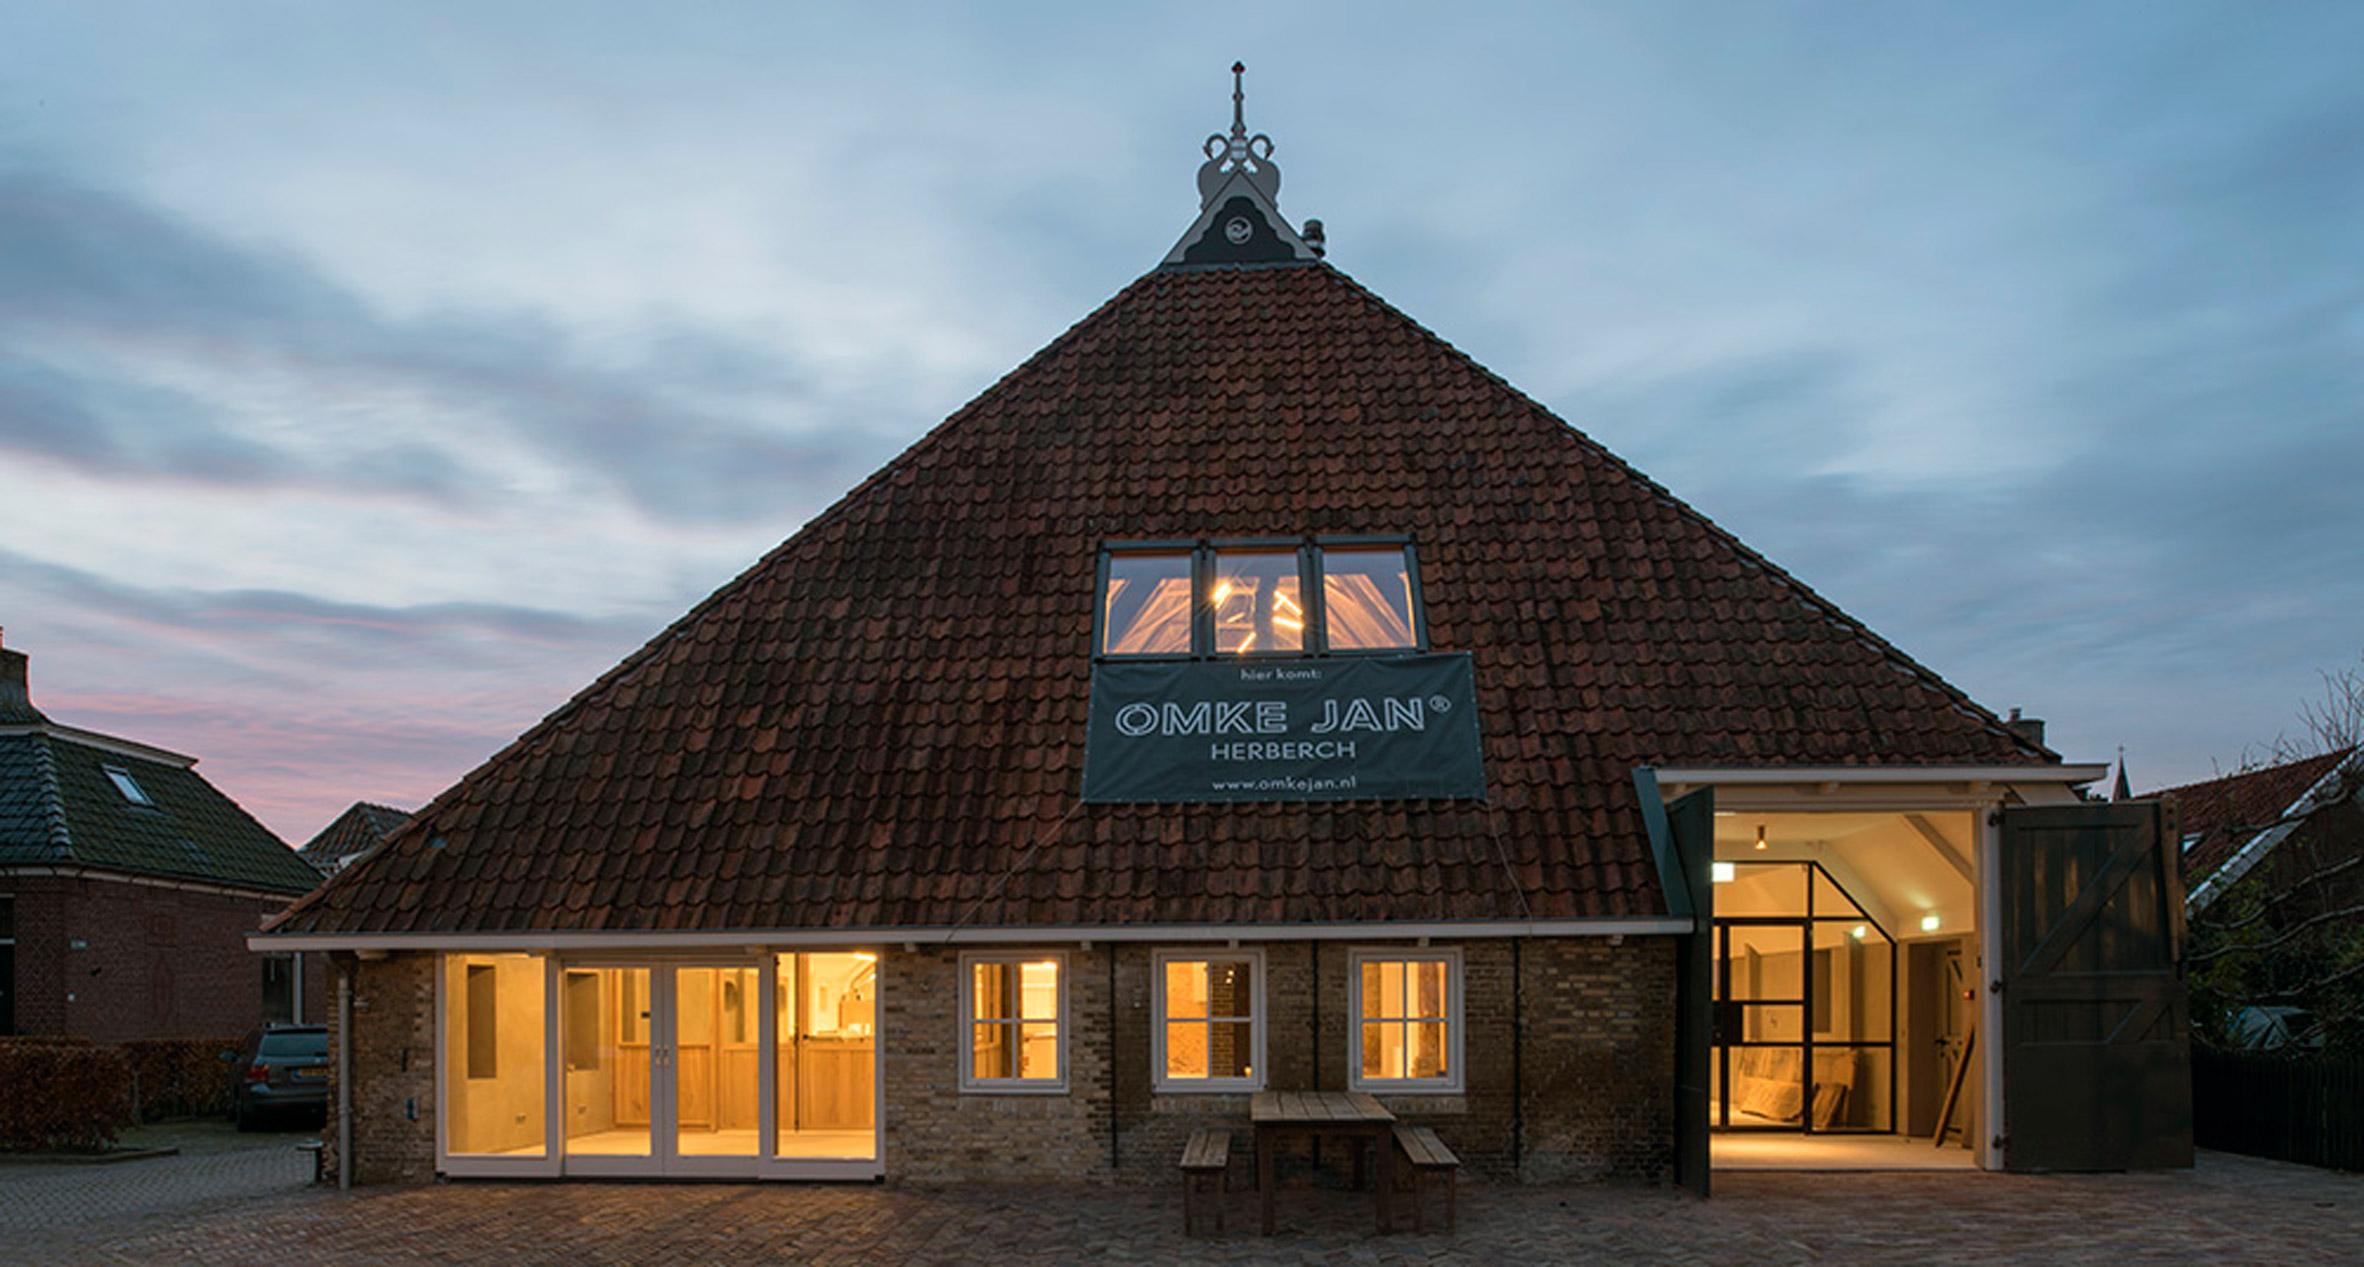 Piet Hein Eek and Iggie Dekkers convert Friesian barn into rustic guesthouse